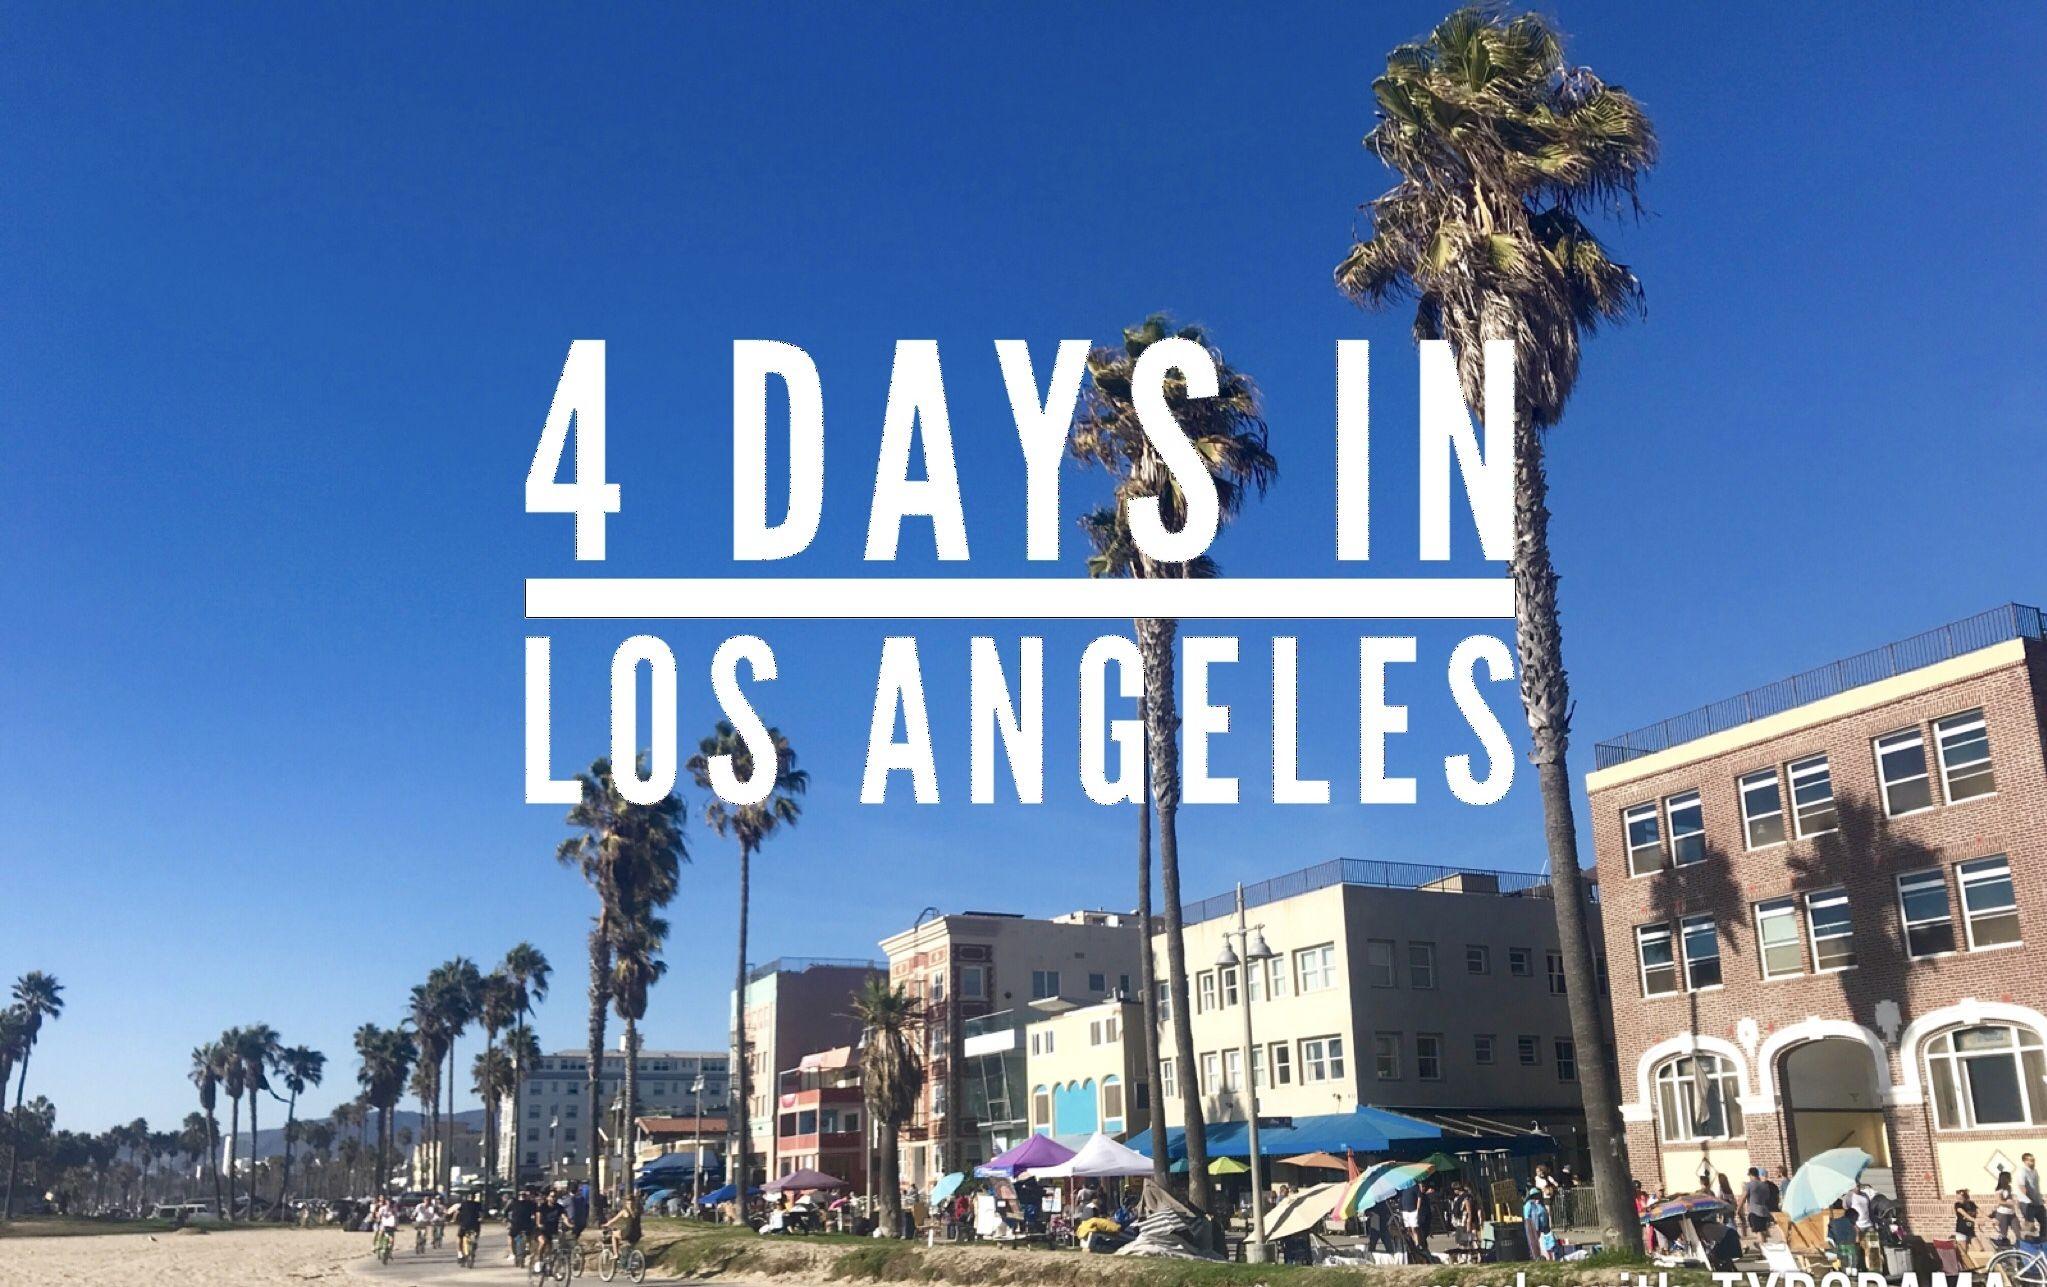 4 Days In Los Angeles La Itinerary What To Do In Venice Beach Santa Monica Malibu Beach Hol Los Angeles Itinerary Los Angeles Vacation Los Angeles Hotels